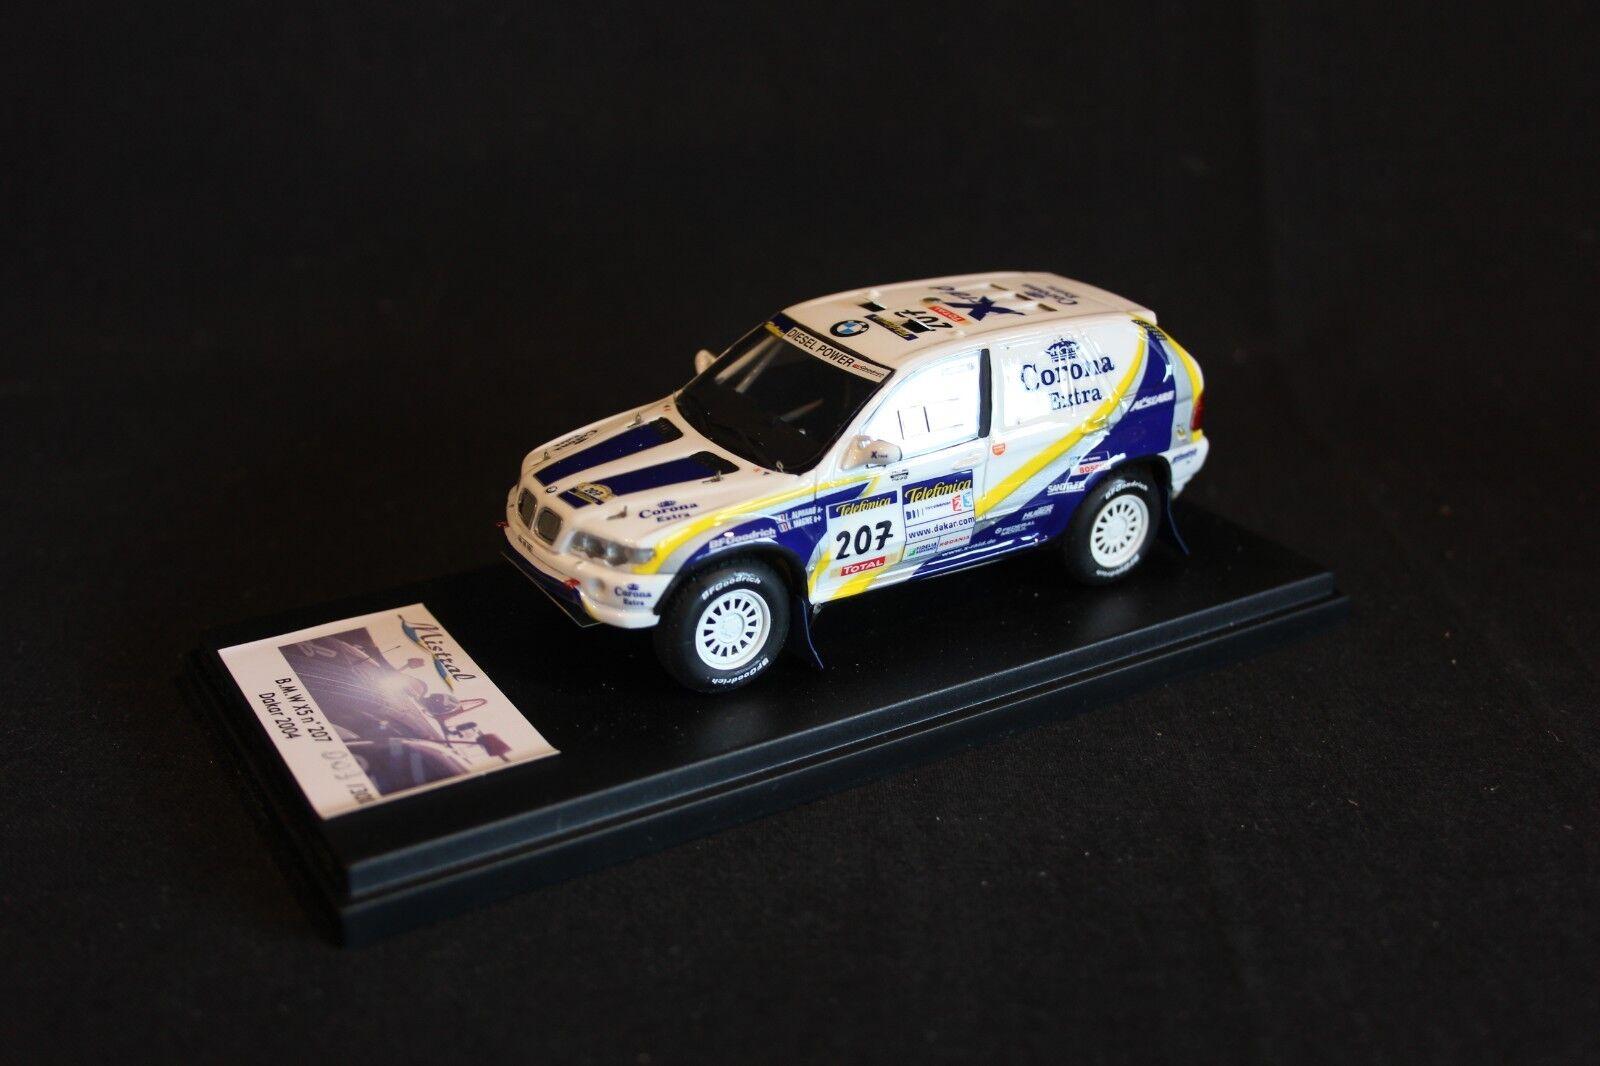 Mistral BMW X5 Rallye X-Raid 2004 1 43 Alphand   Magne Dakar Rally